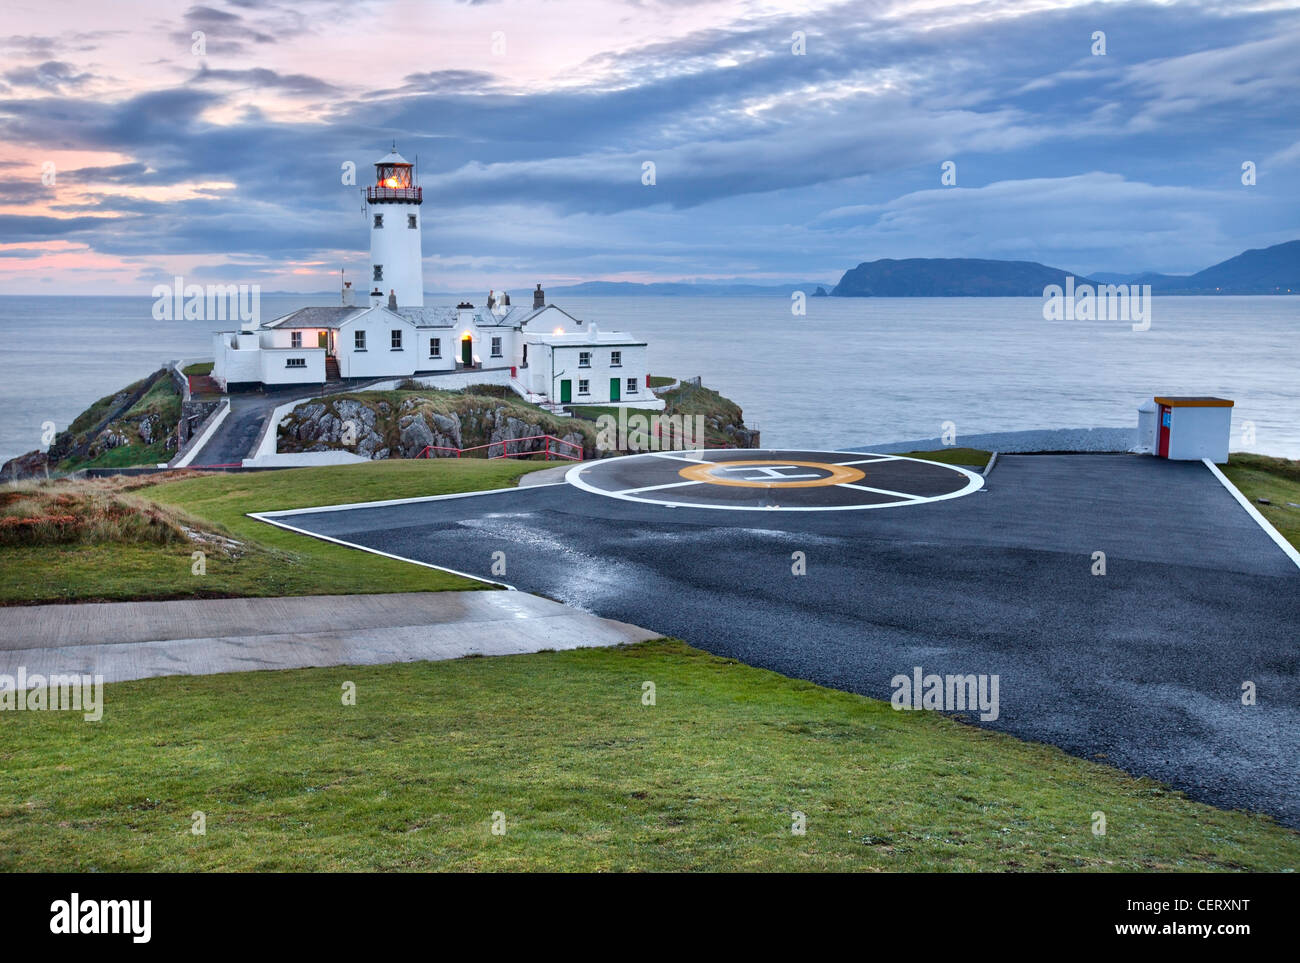 Fanad head Lighthouse, Donegal Ireland. - Stock Image